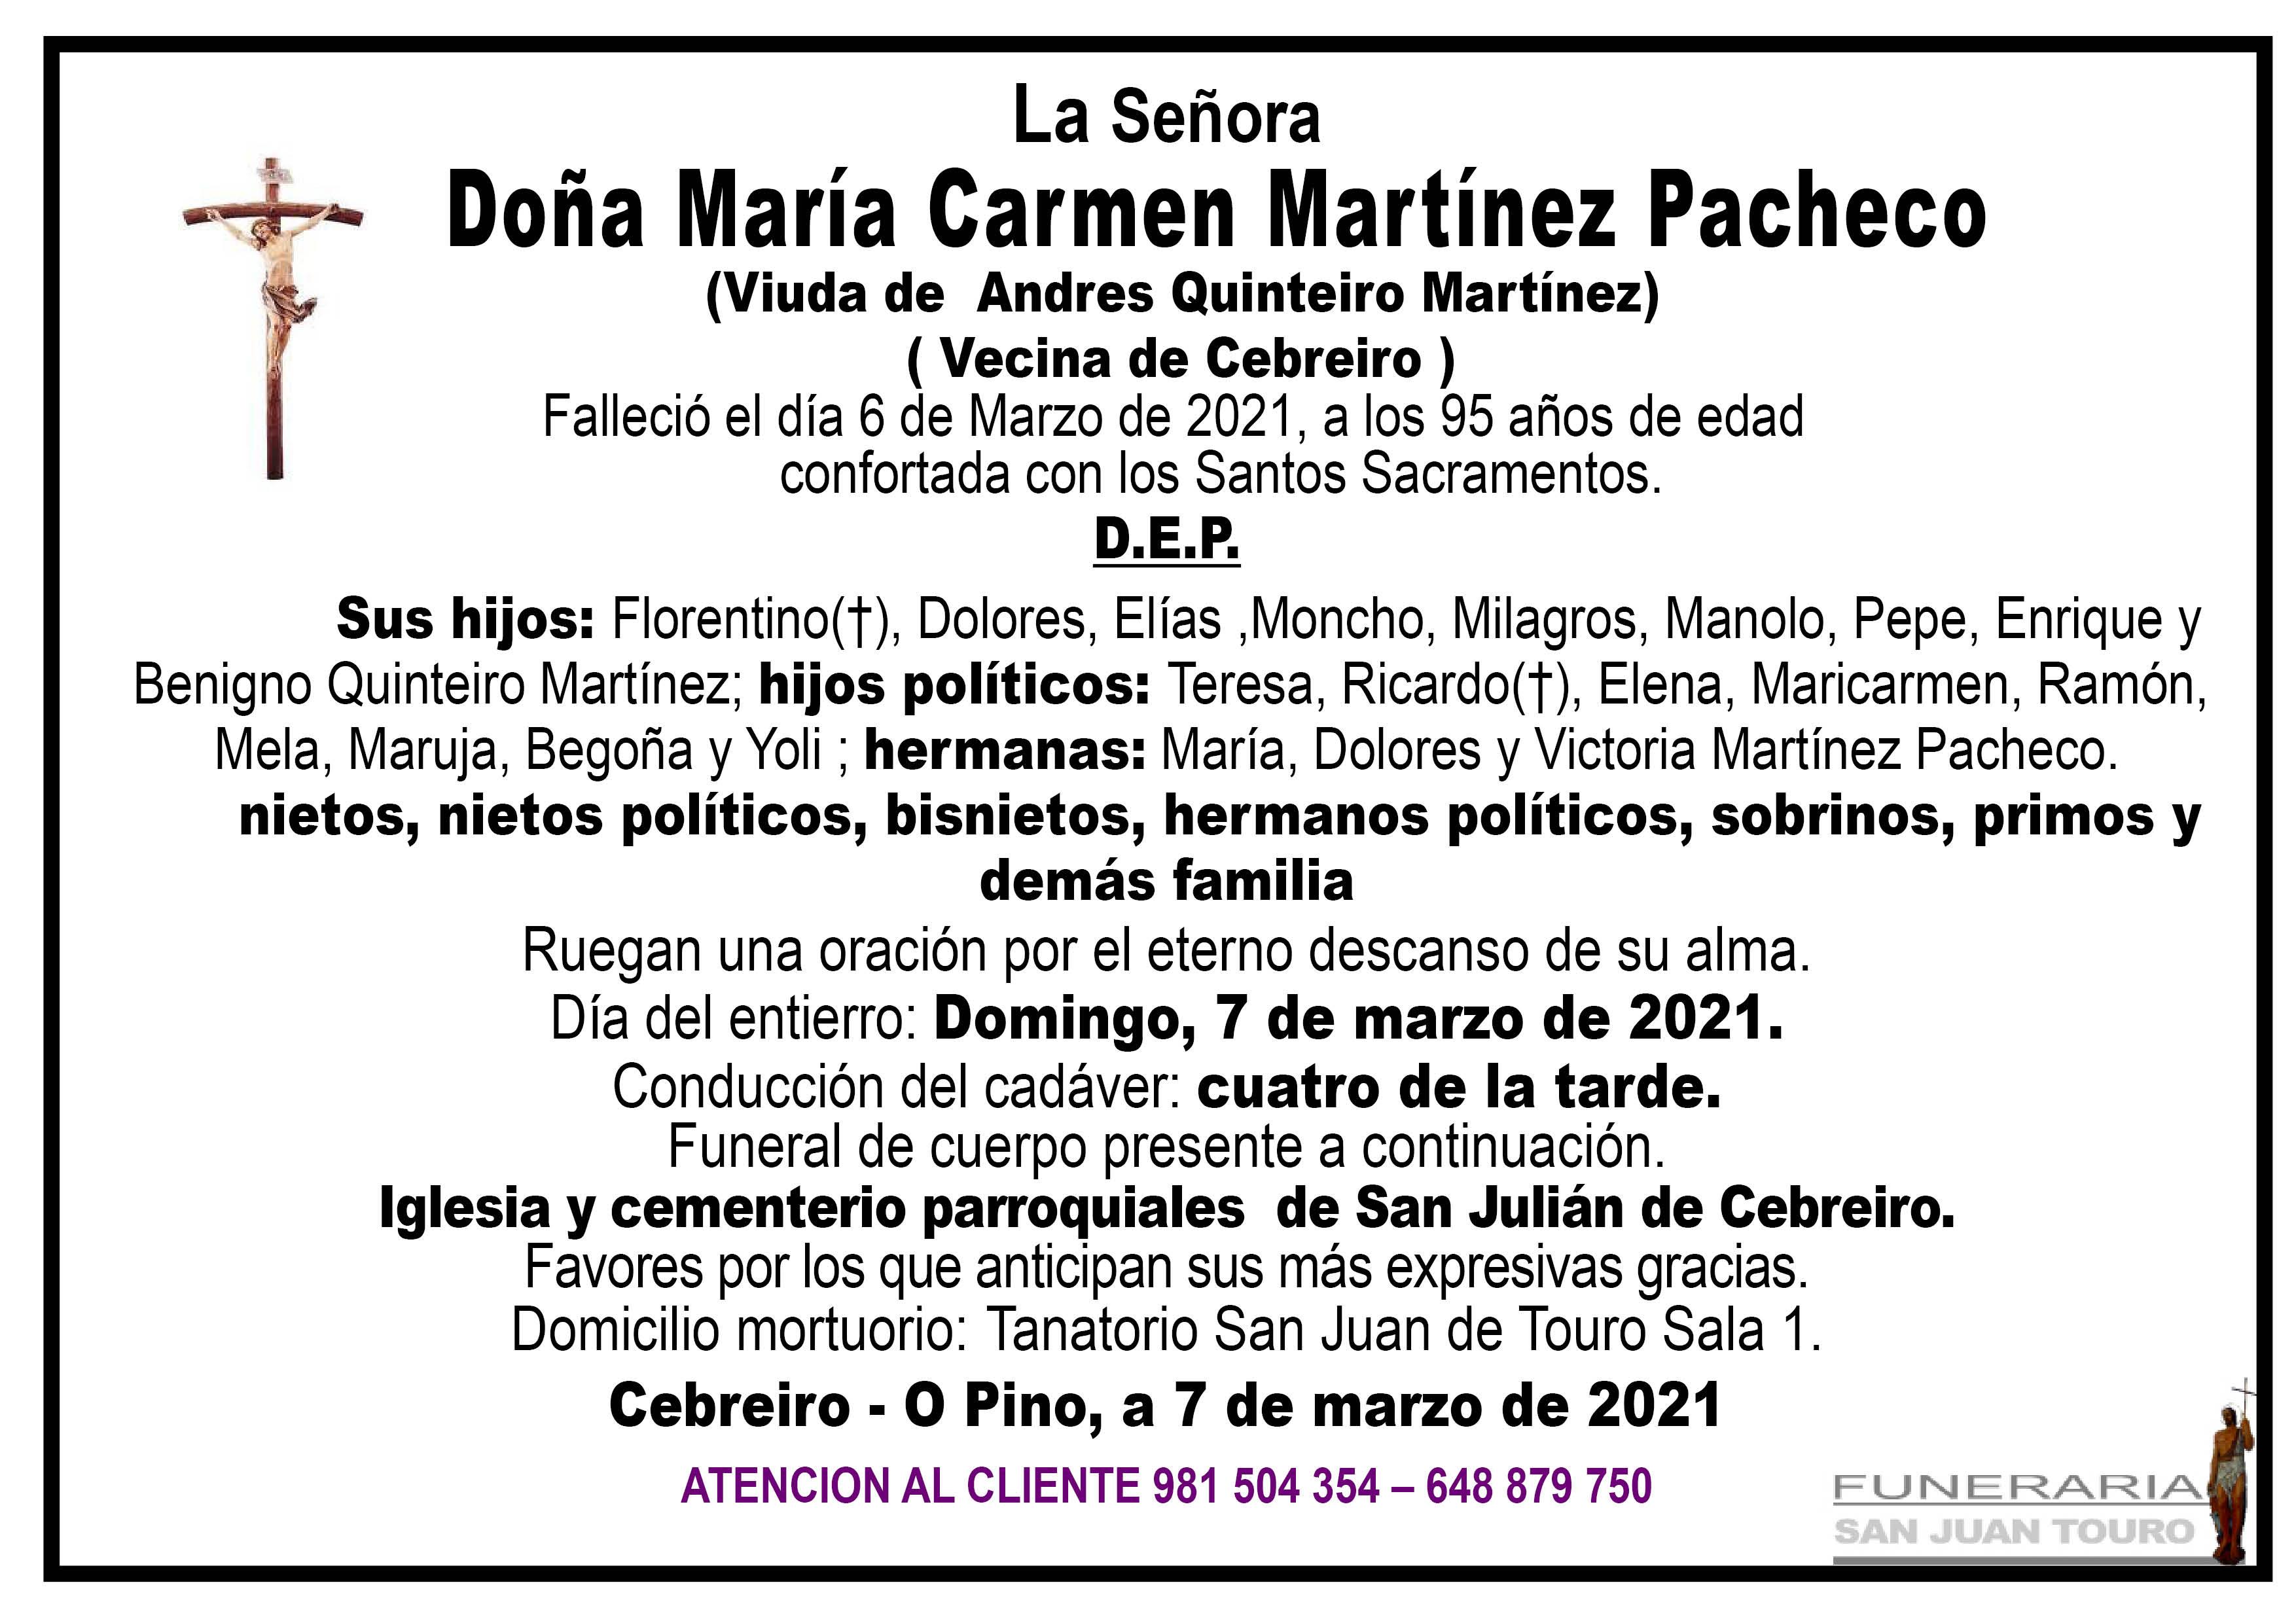 Esquela de SEPELIO DE DOÑA MARIA CARMEN MARTÍNEZ PACHECO